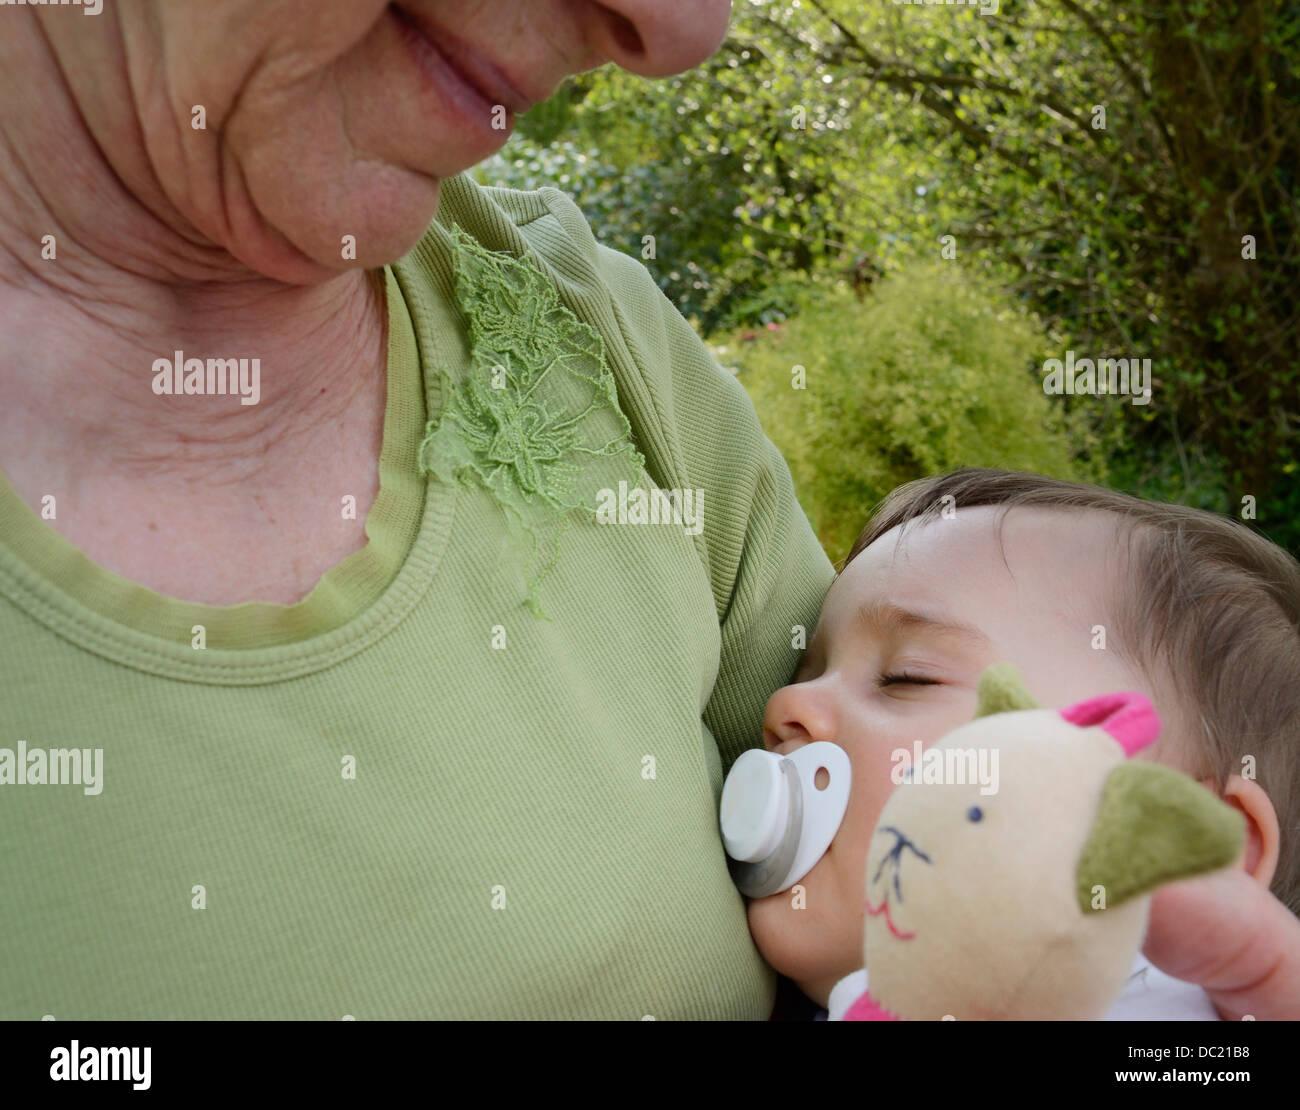 Ältere Frau mit schlafenden Enkelin, Nahaufnahme Stockbild